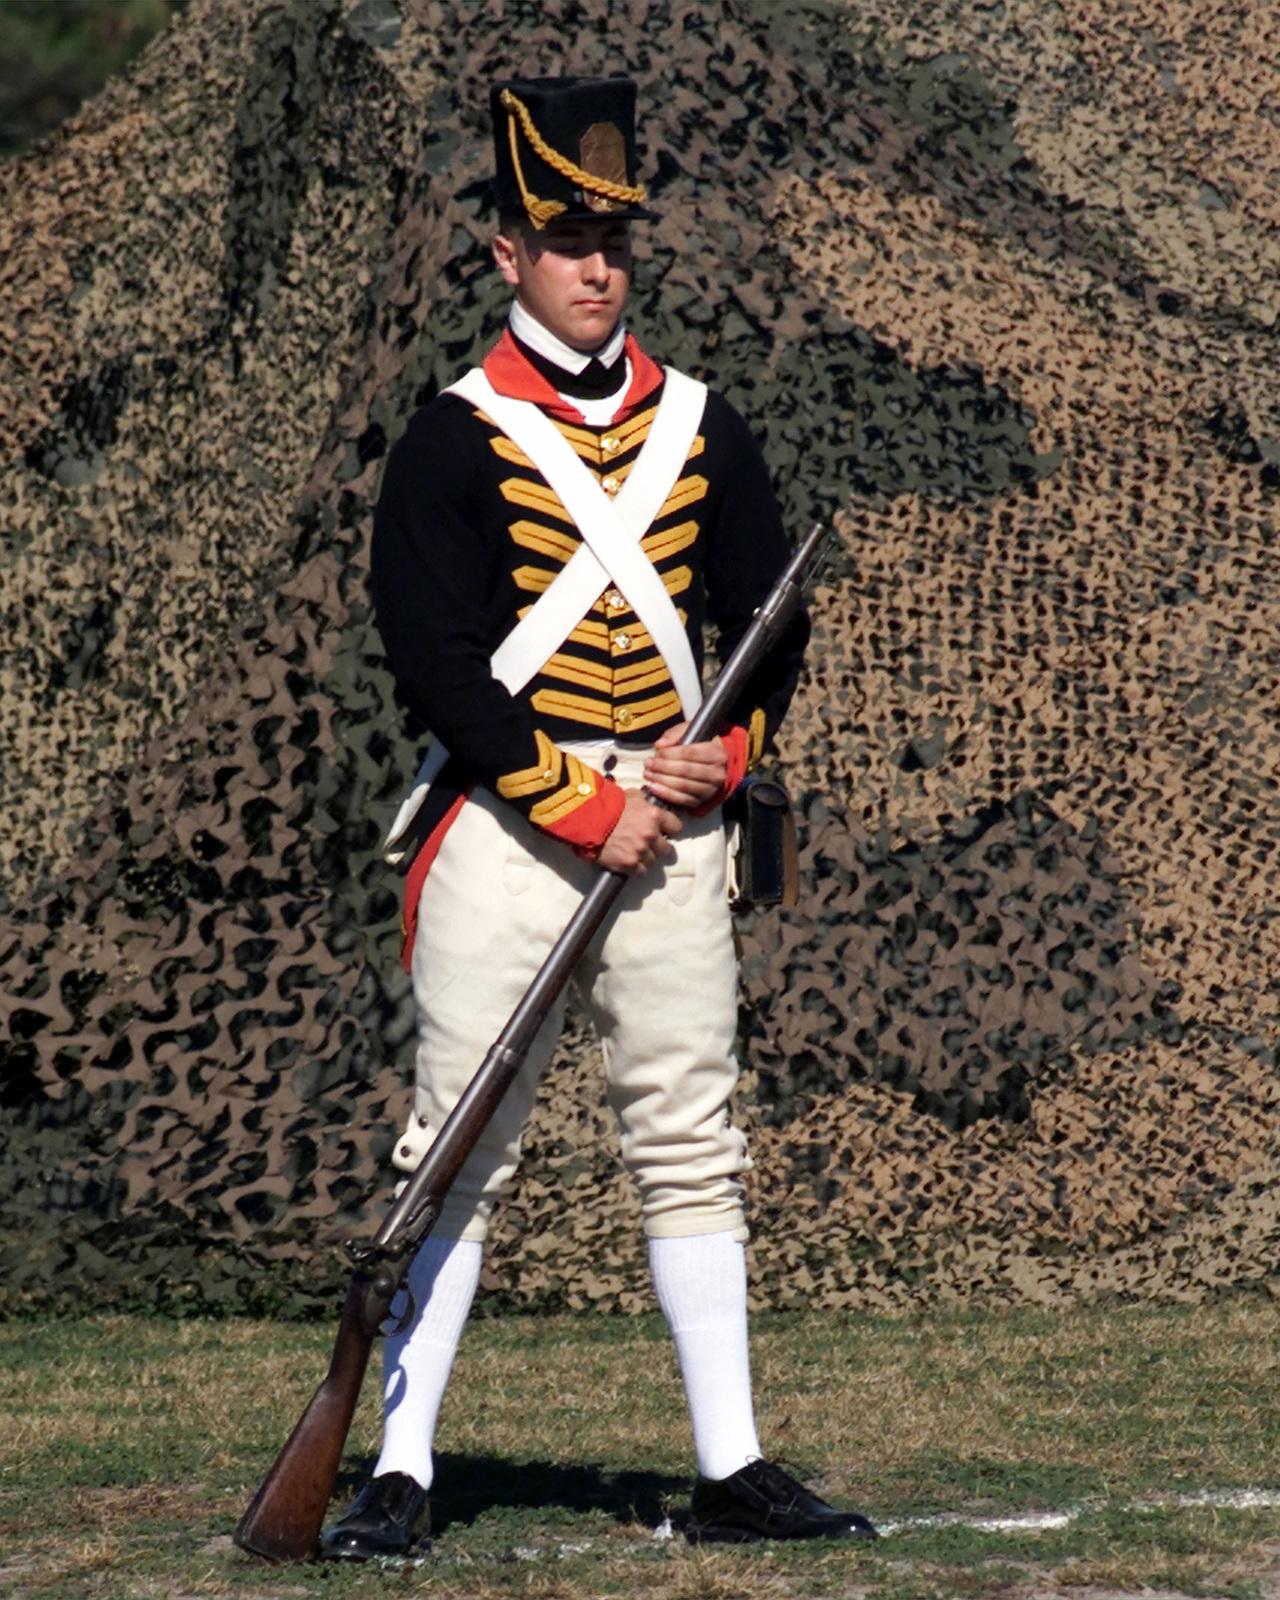 A US Marine displays the US Marine Corps Revolutionary War